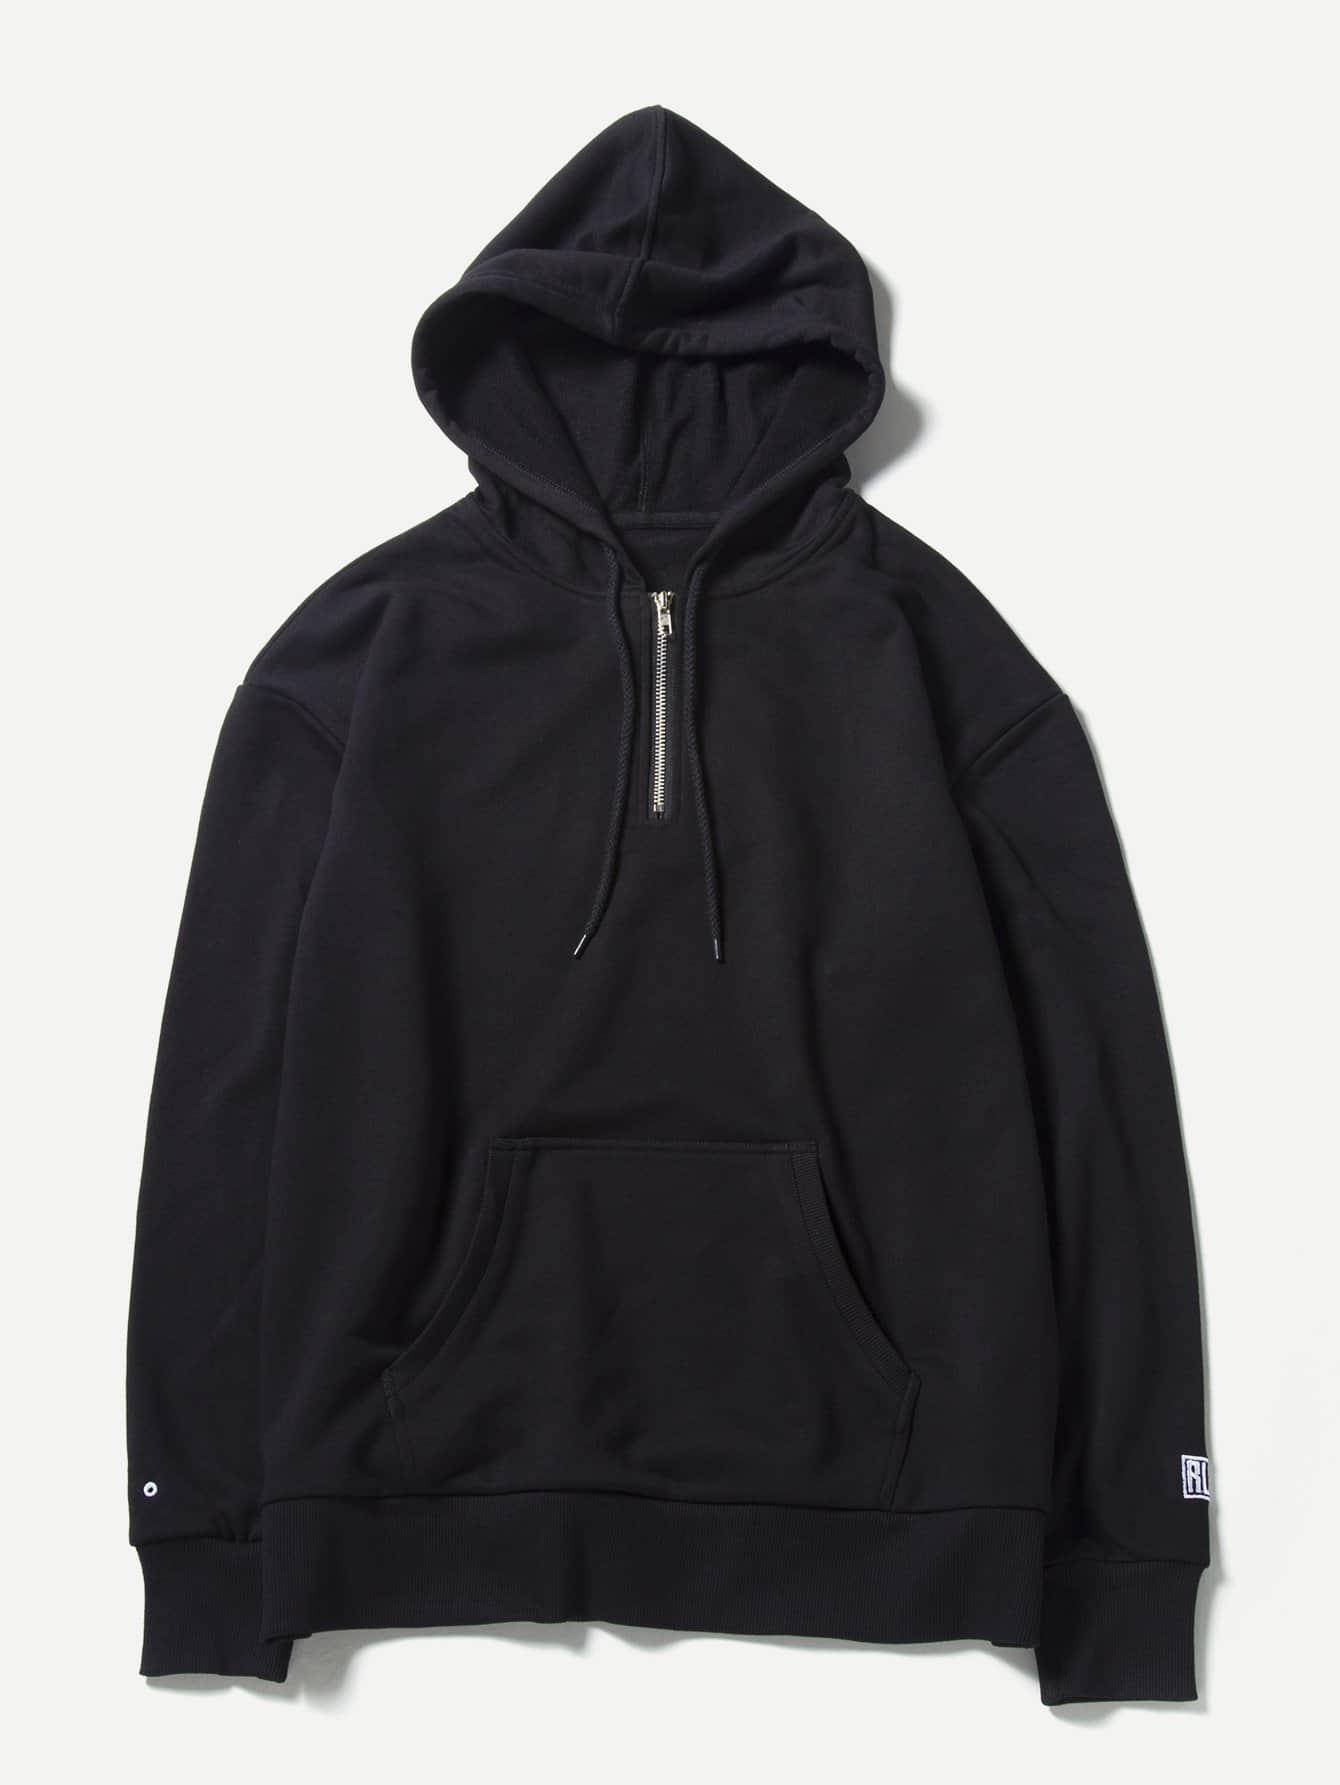 Men Letter Print Zip Decoration Hooded Sweatshirt plus size letter print hooded sweatshirt dress